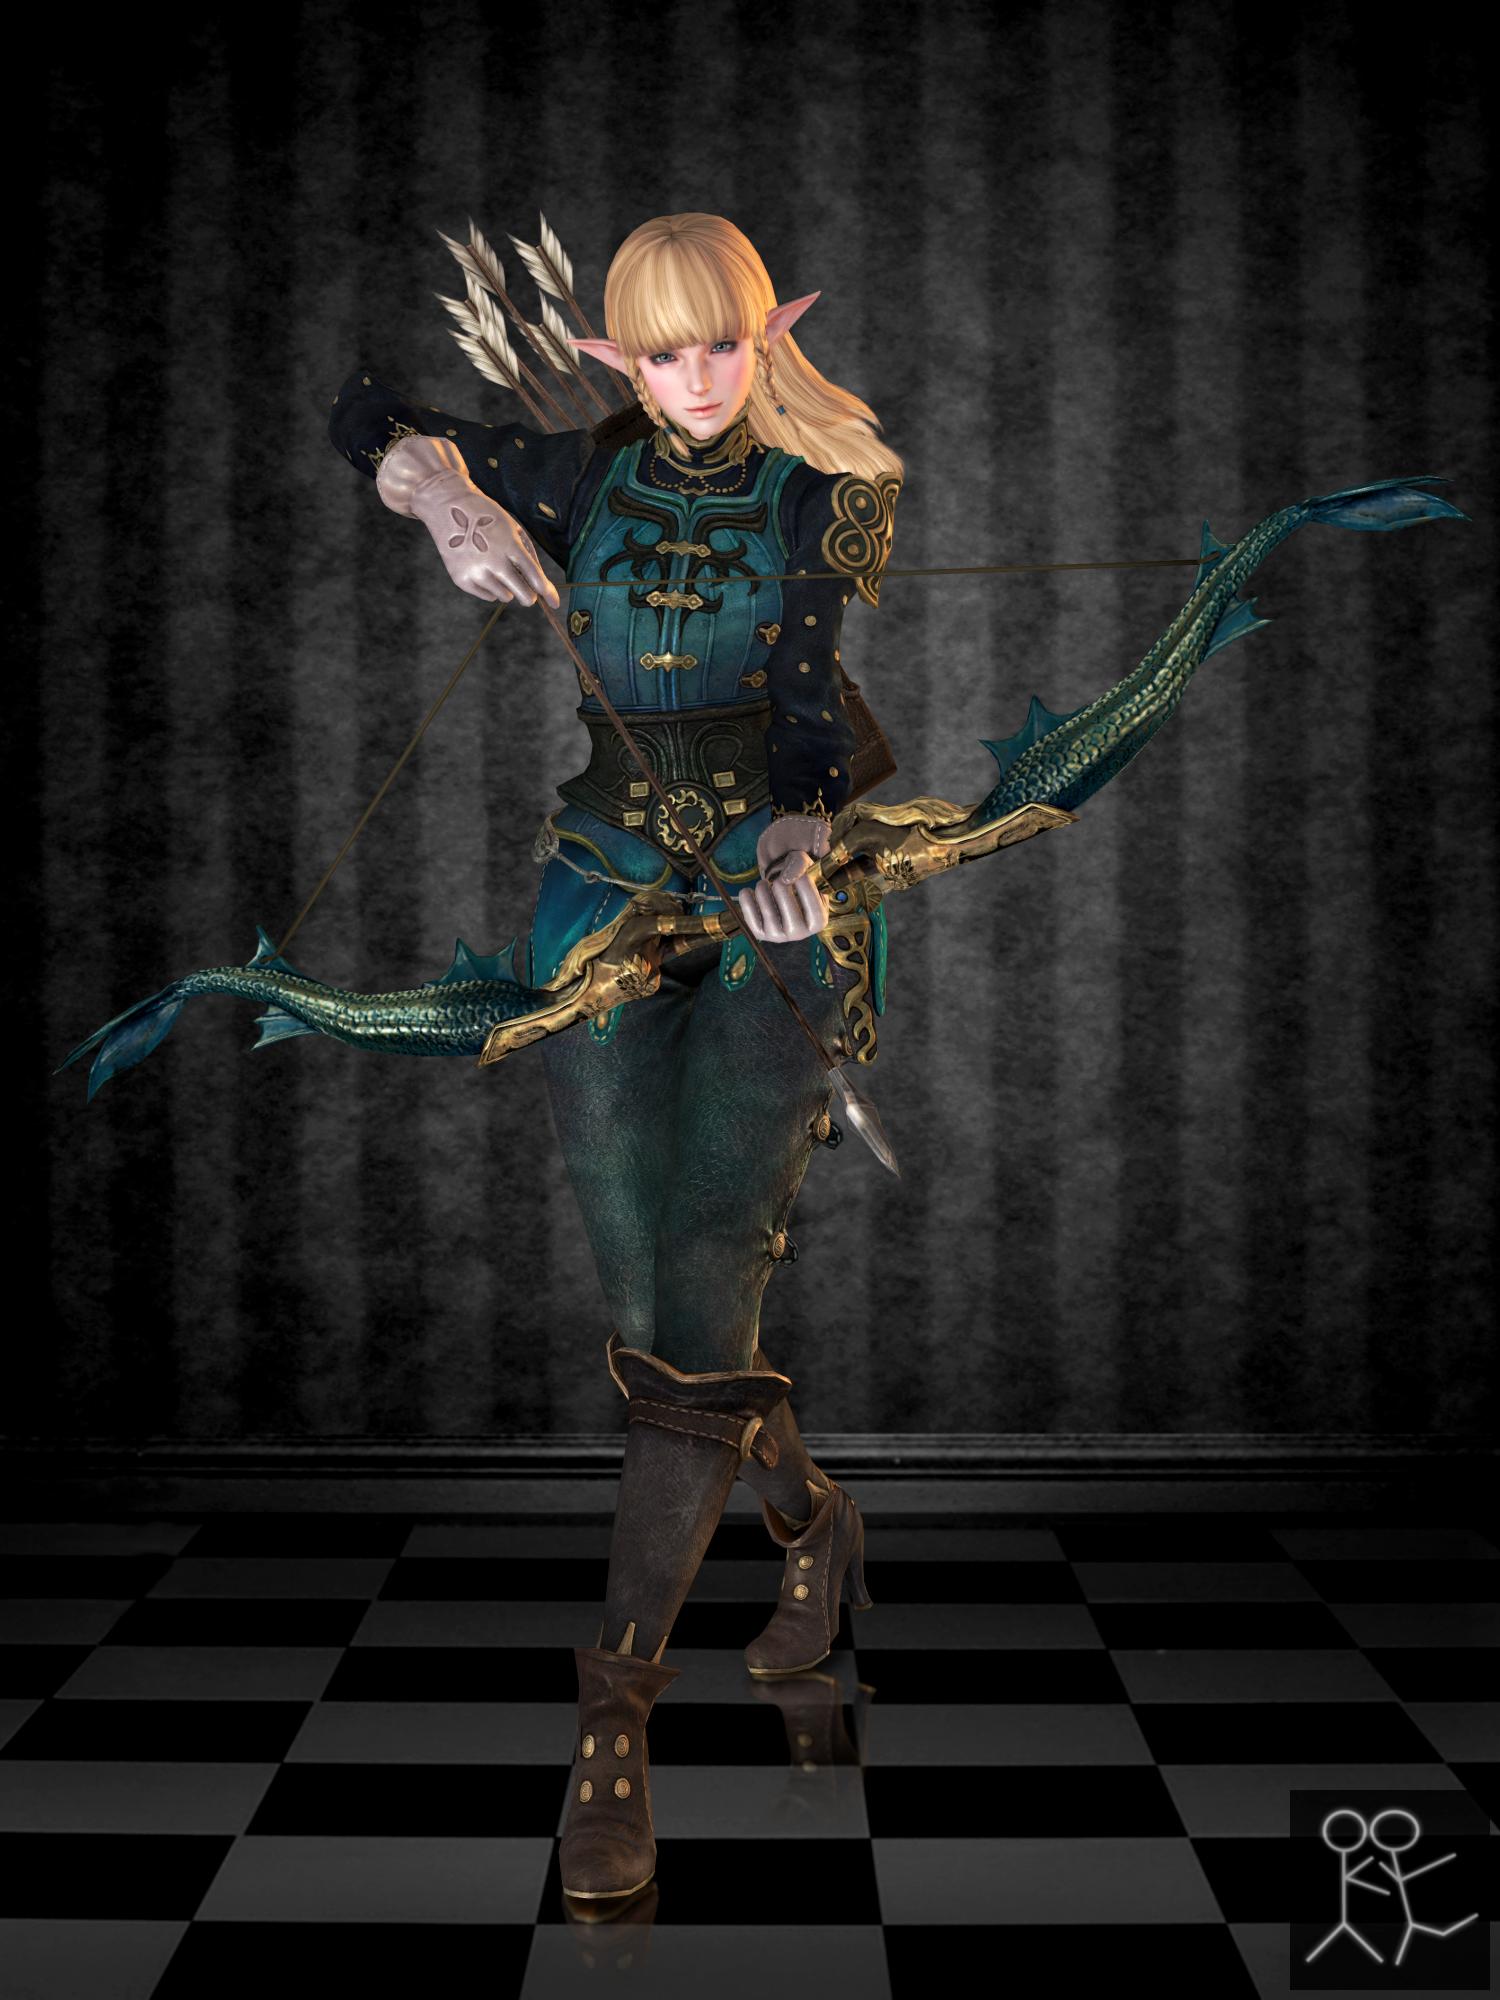 Bless Online - Lorien (custom female Elf) by Sticklove